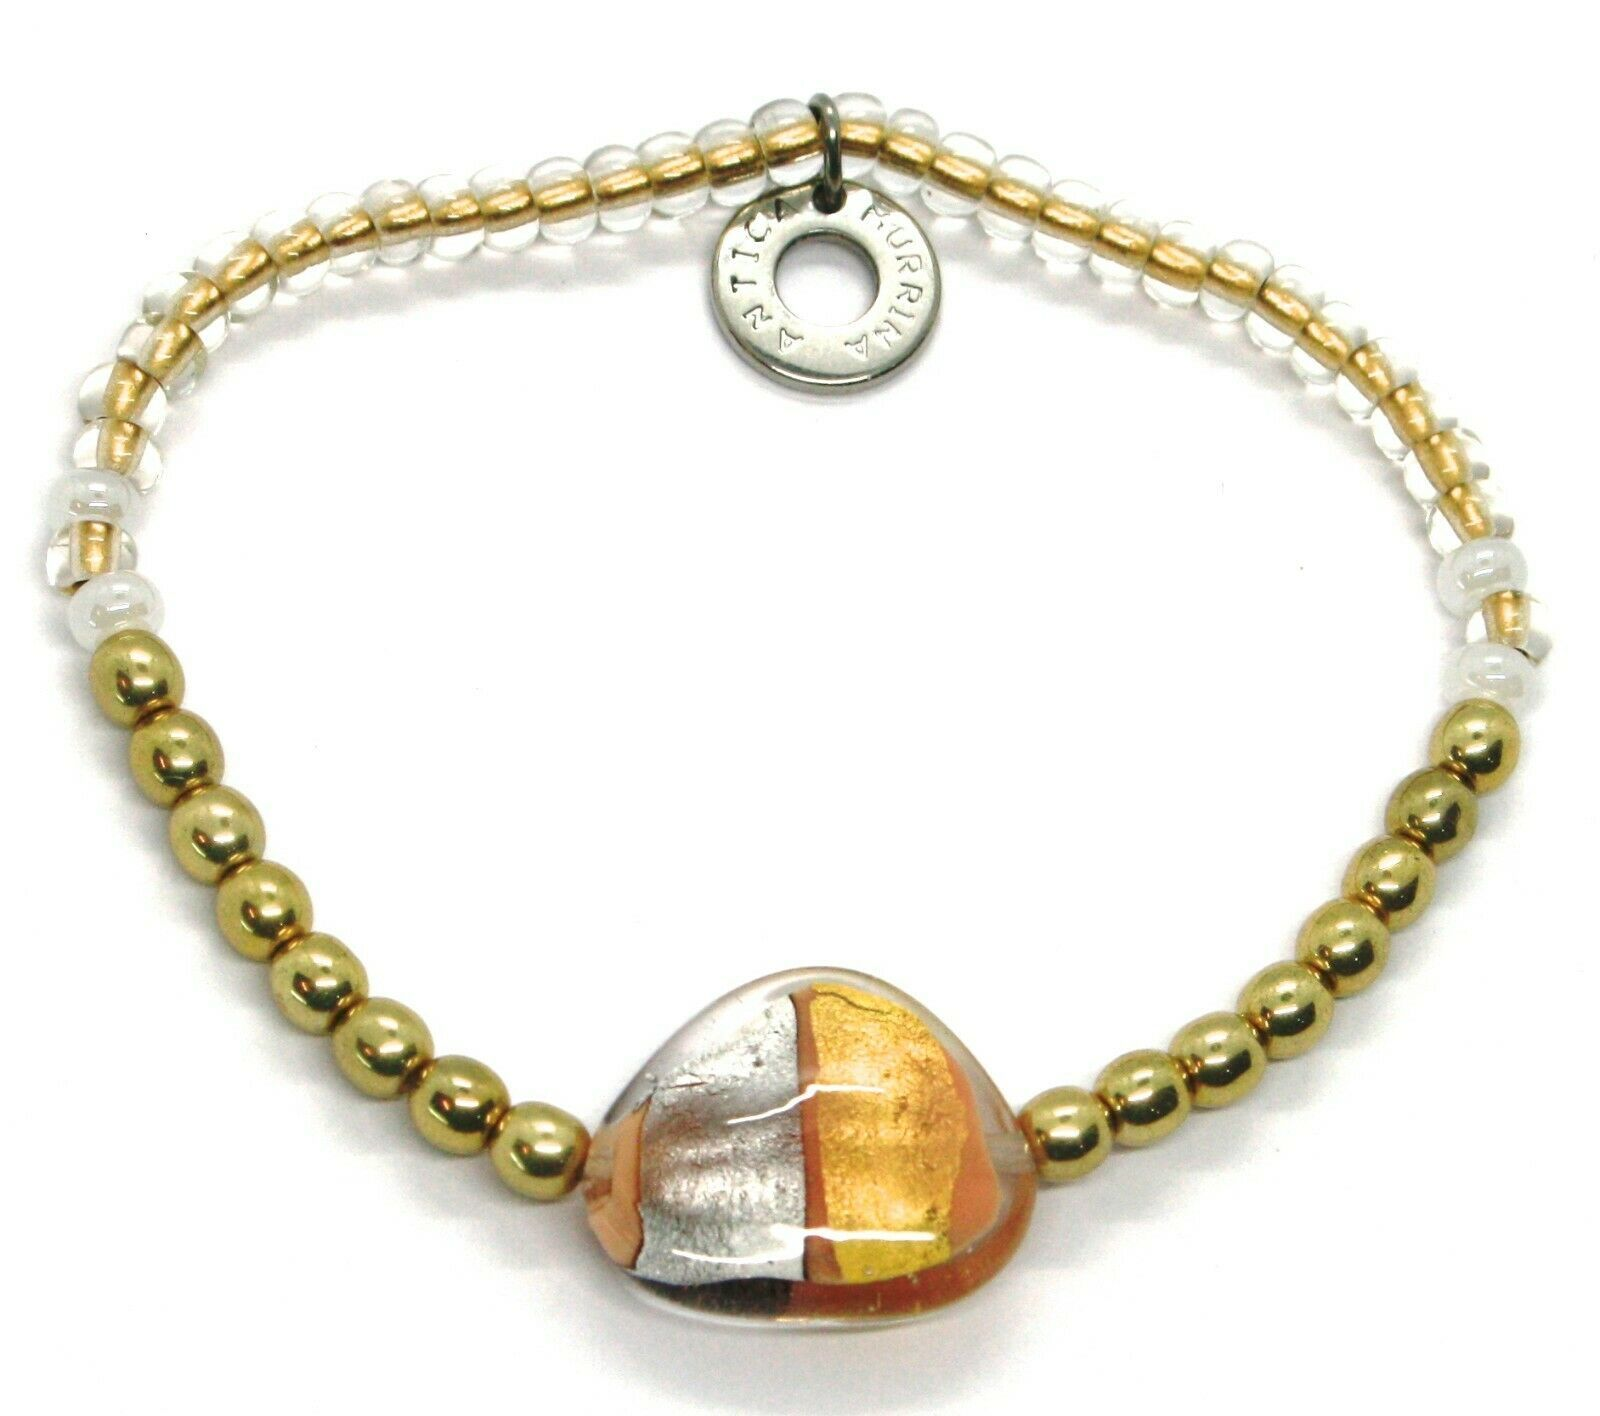 Bracelet Antica Murrina Venezia BR748A02, Moretta, Drop Banded, Elastic